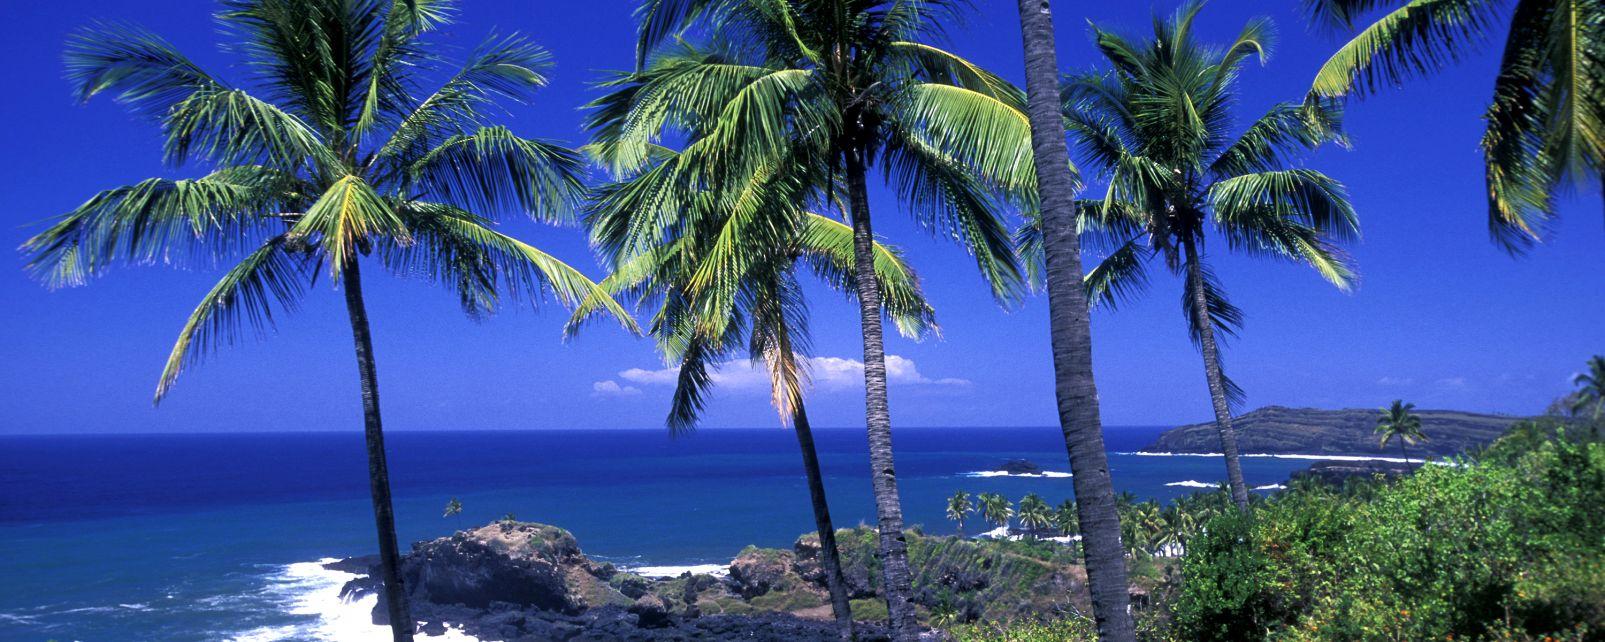 Itsandra Beach Hotel Moroni Comores